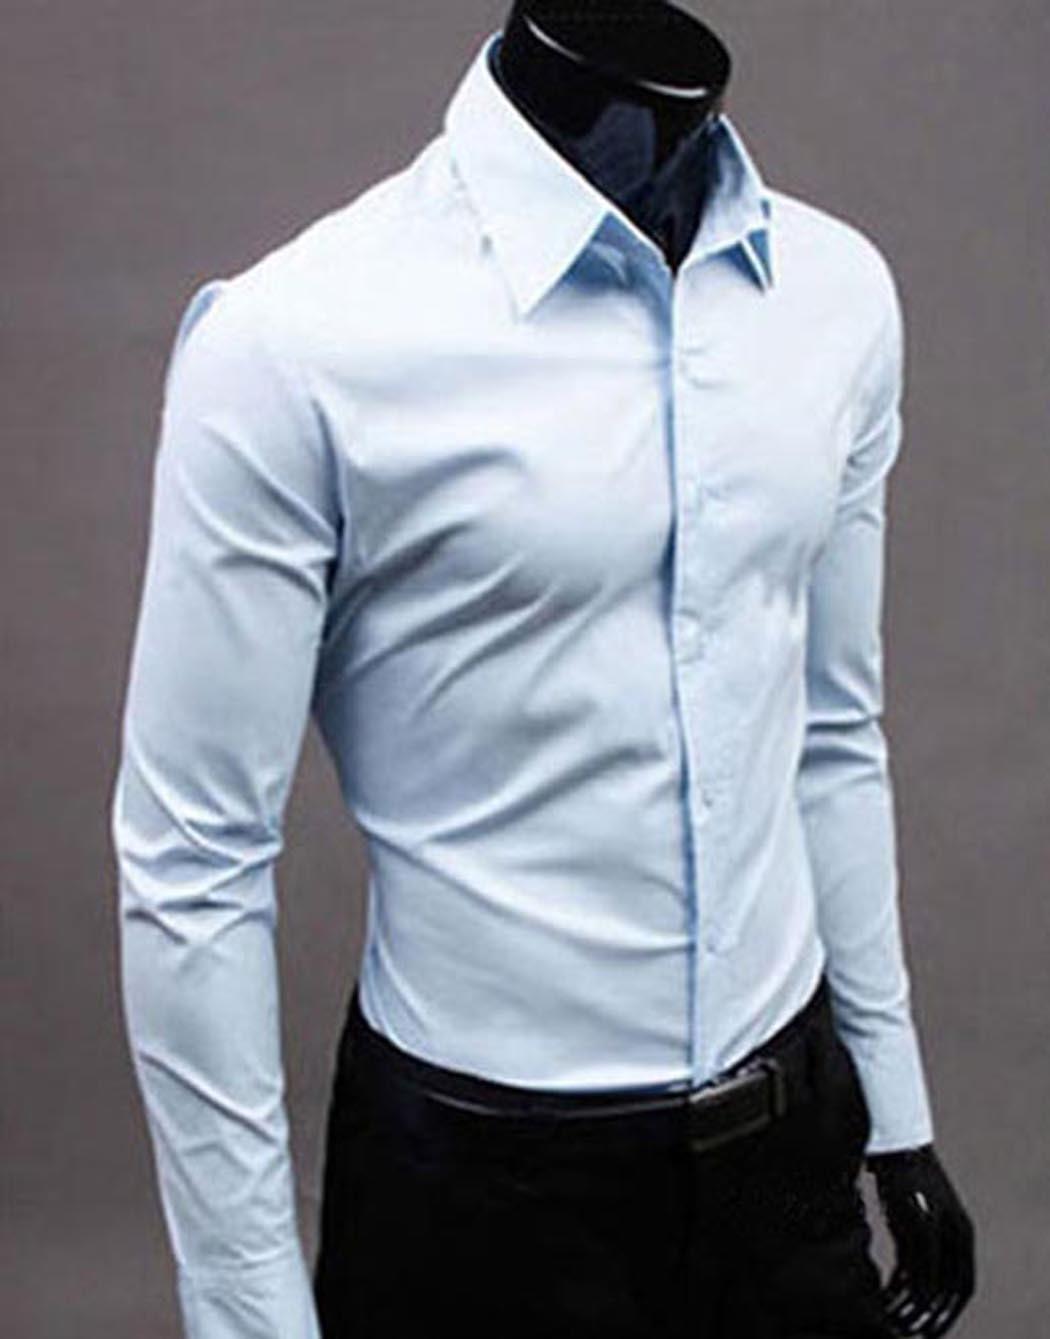 47b6621c9b9 2017 Mens Shirt Bussiness Shirt Formal Pink Slim Fit Long Sleeve Tops Solid  New White Black Pink 004